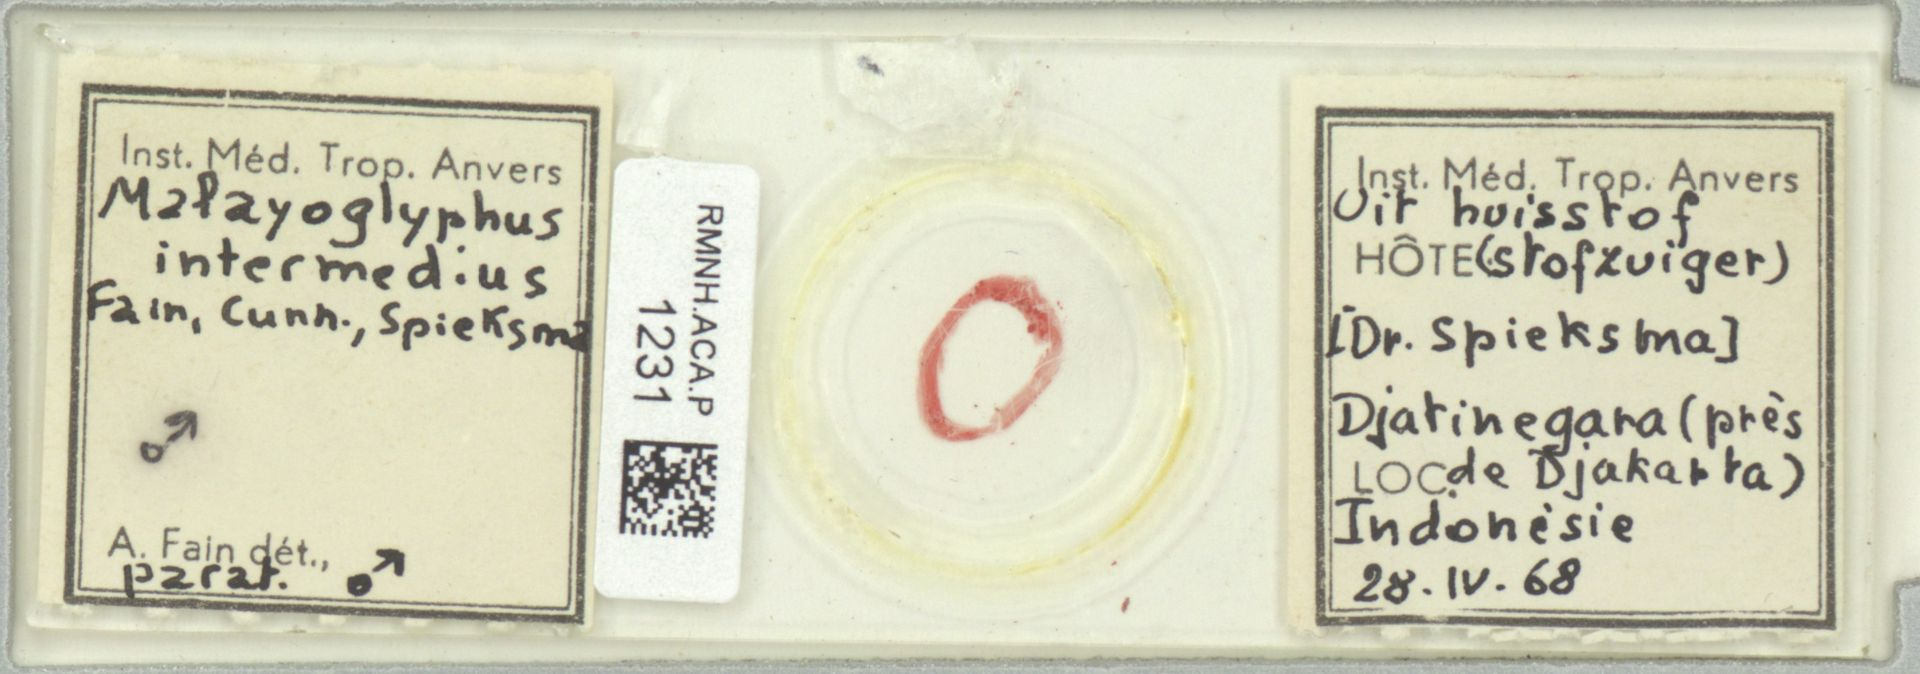 RMNH.ACA.P.1231   Malayoglyphus intermedius Fain, Cunn., Spieksma